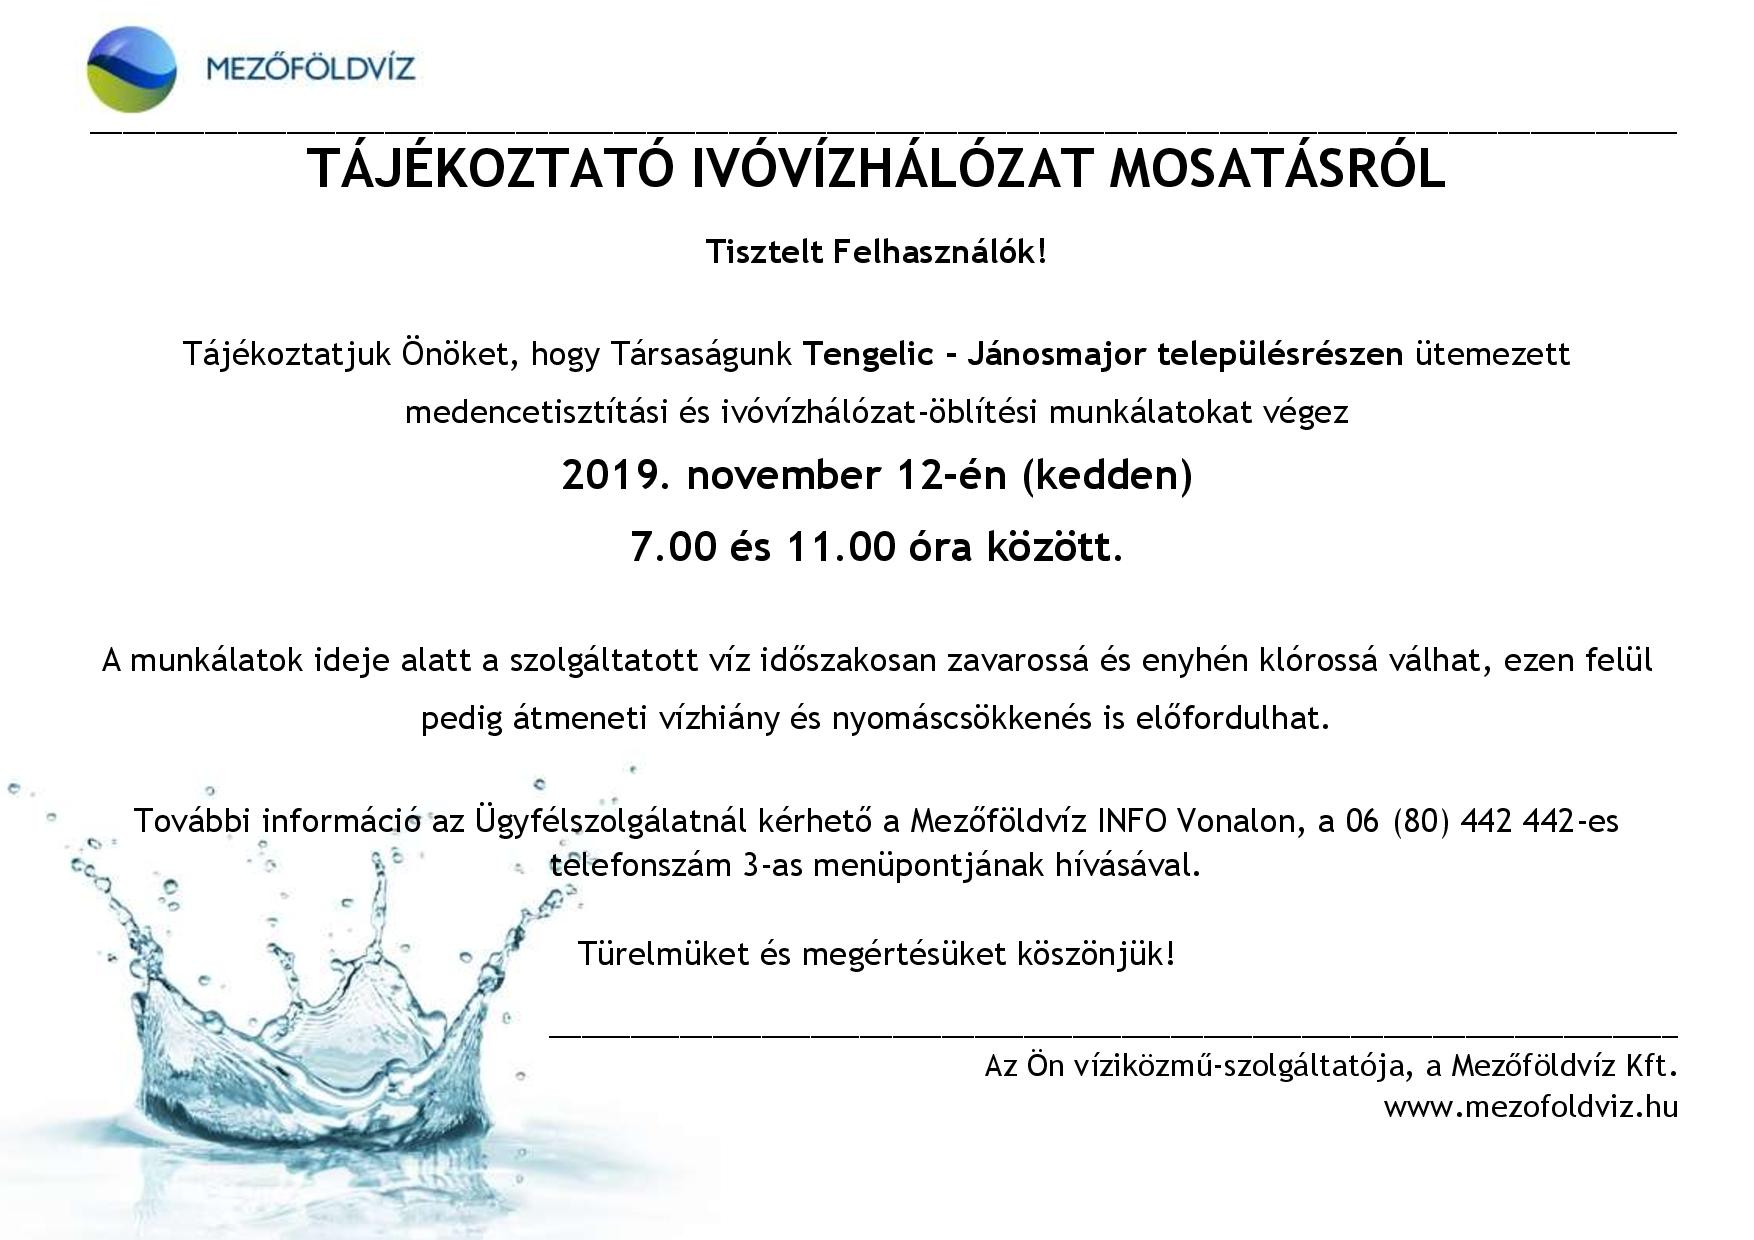 Tajekoztato-atmeneti-vizhianyrol-Tengelic-Janosmajorban-page-001